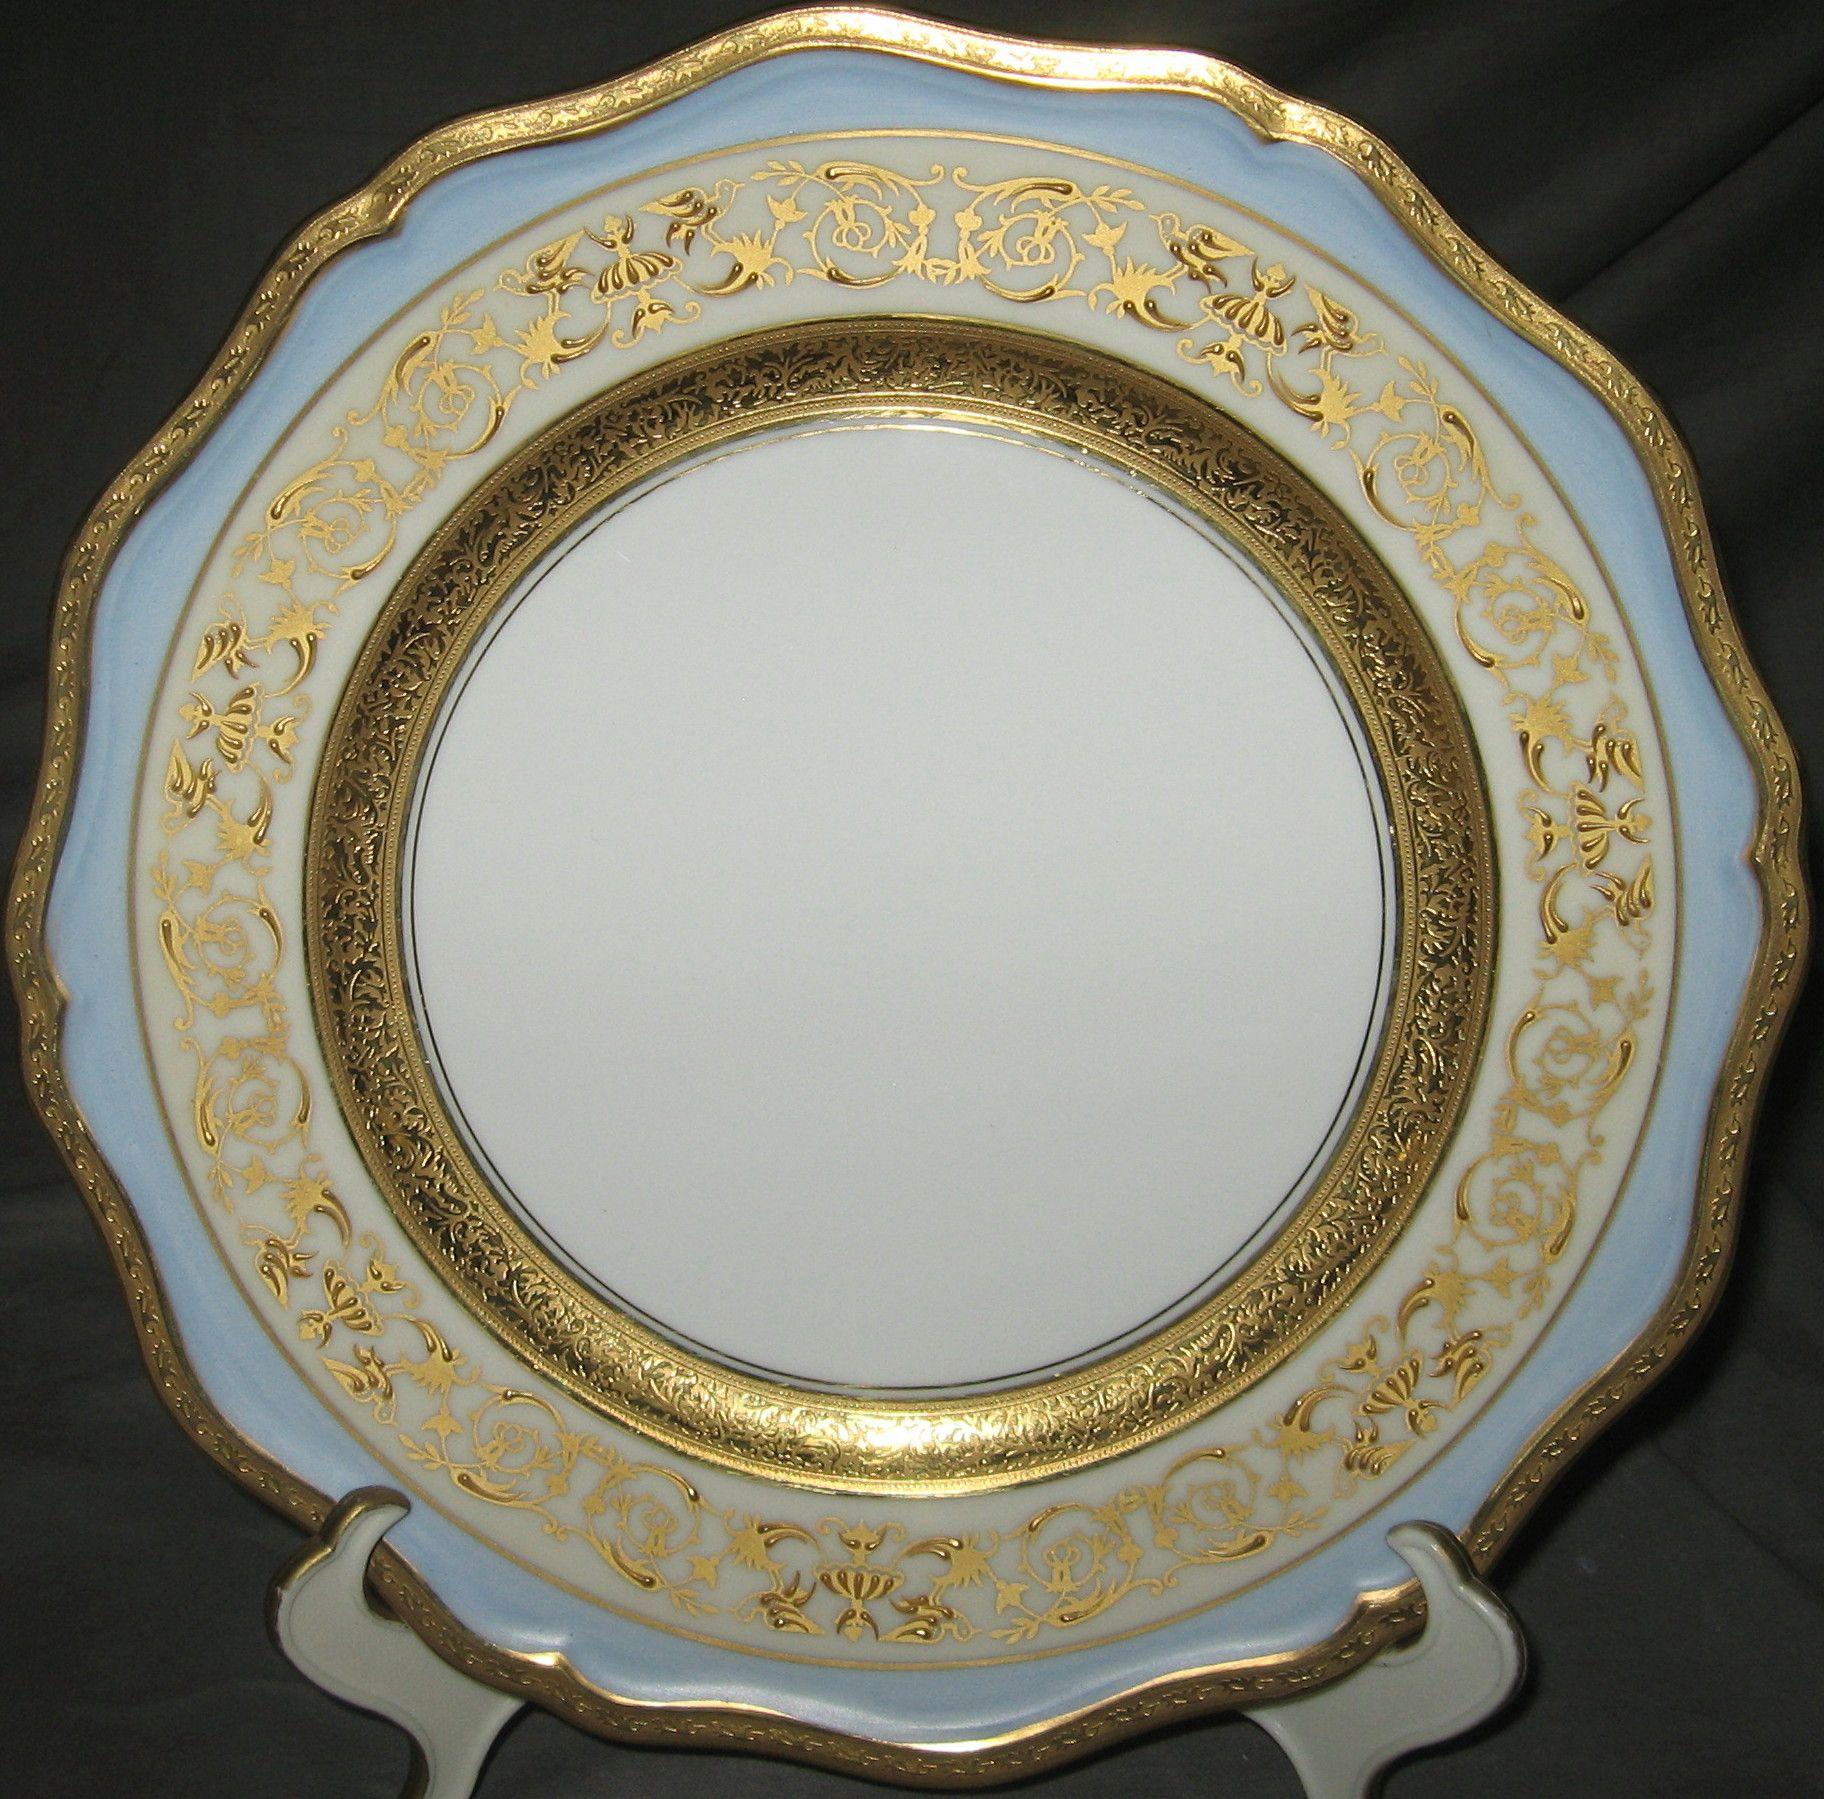 Raynaud Scheherazade Dinner Plate | Really Expensive Stuff ...